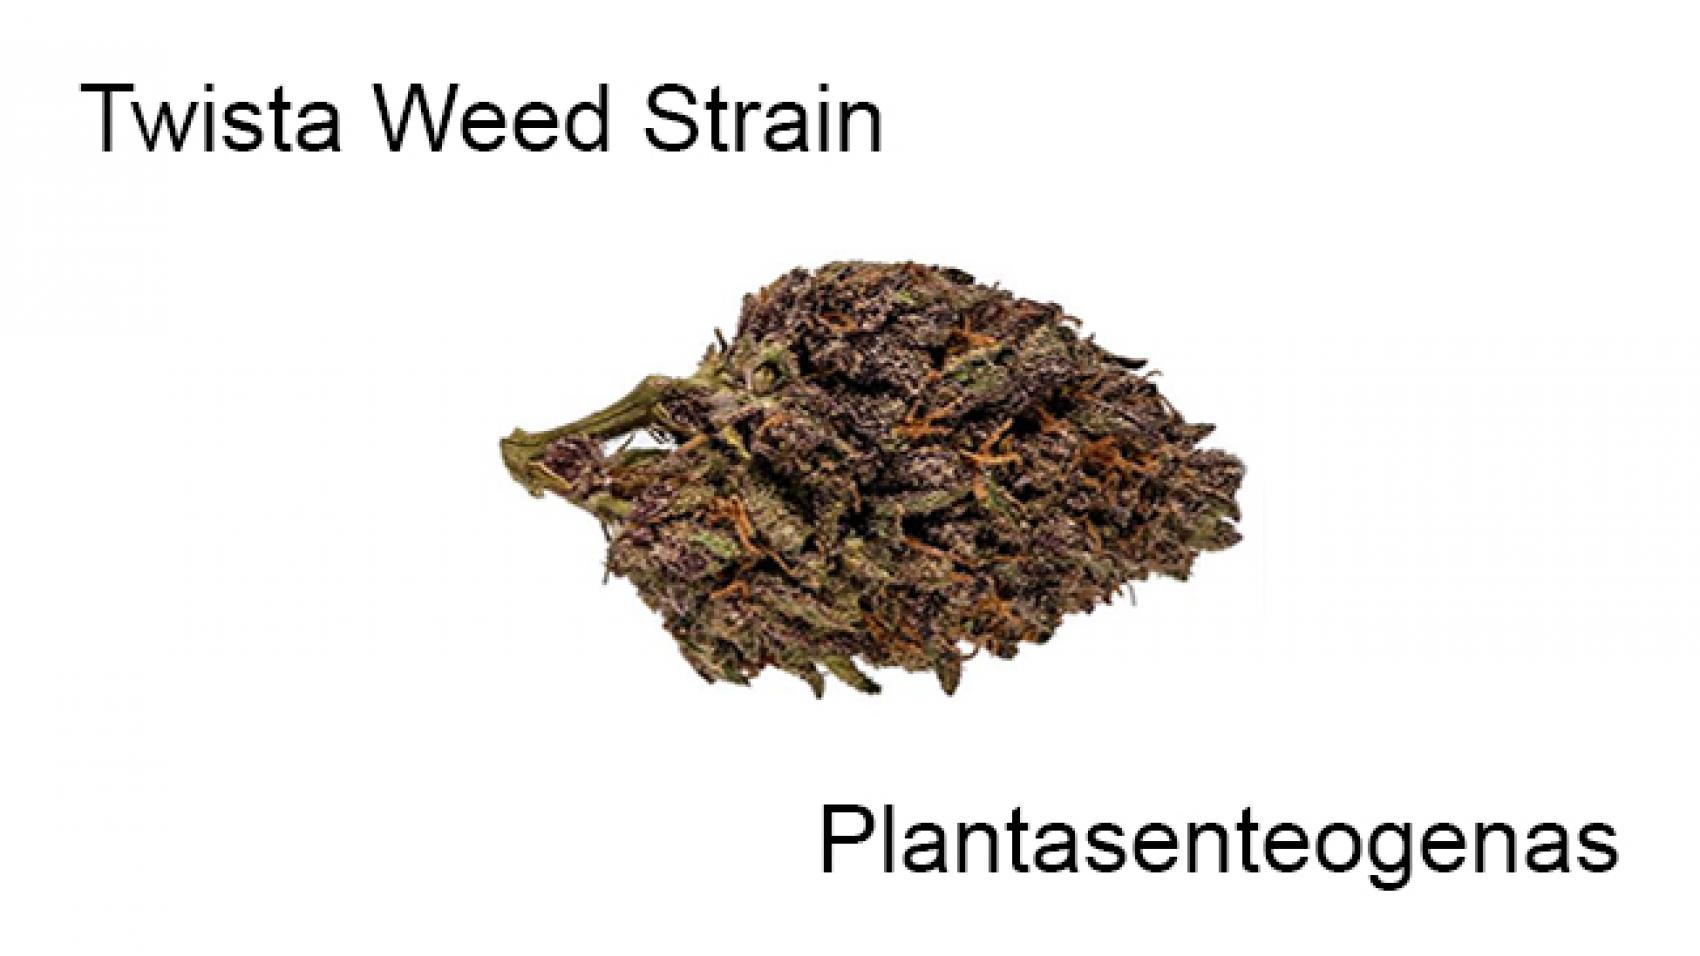 Twista Weed Strain